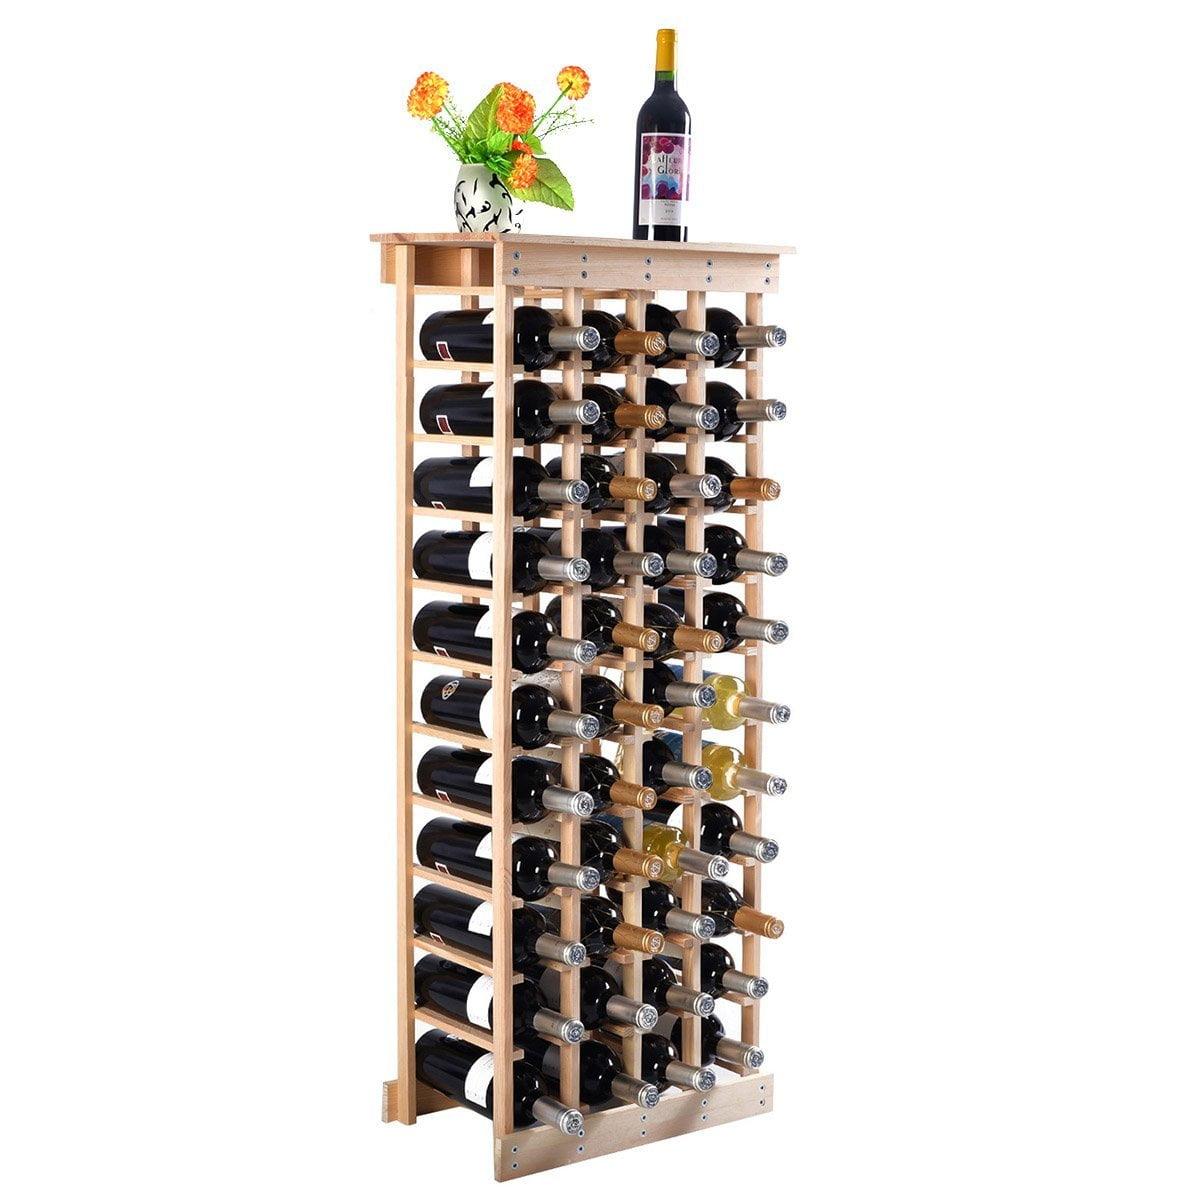 China New MTN-G 44 Bottle Wood Wine Rack Storage Display Shelves Kitchen Decor Natural